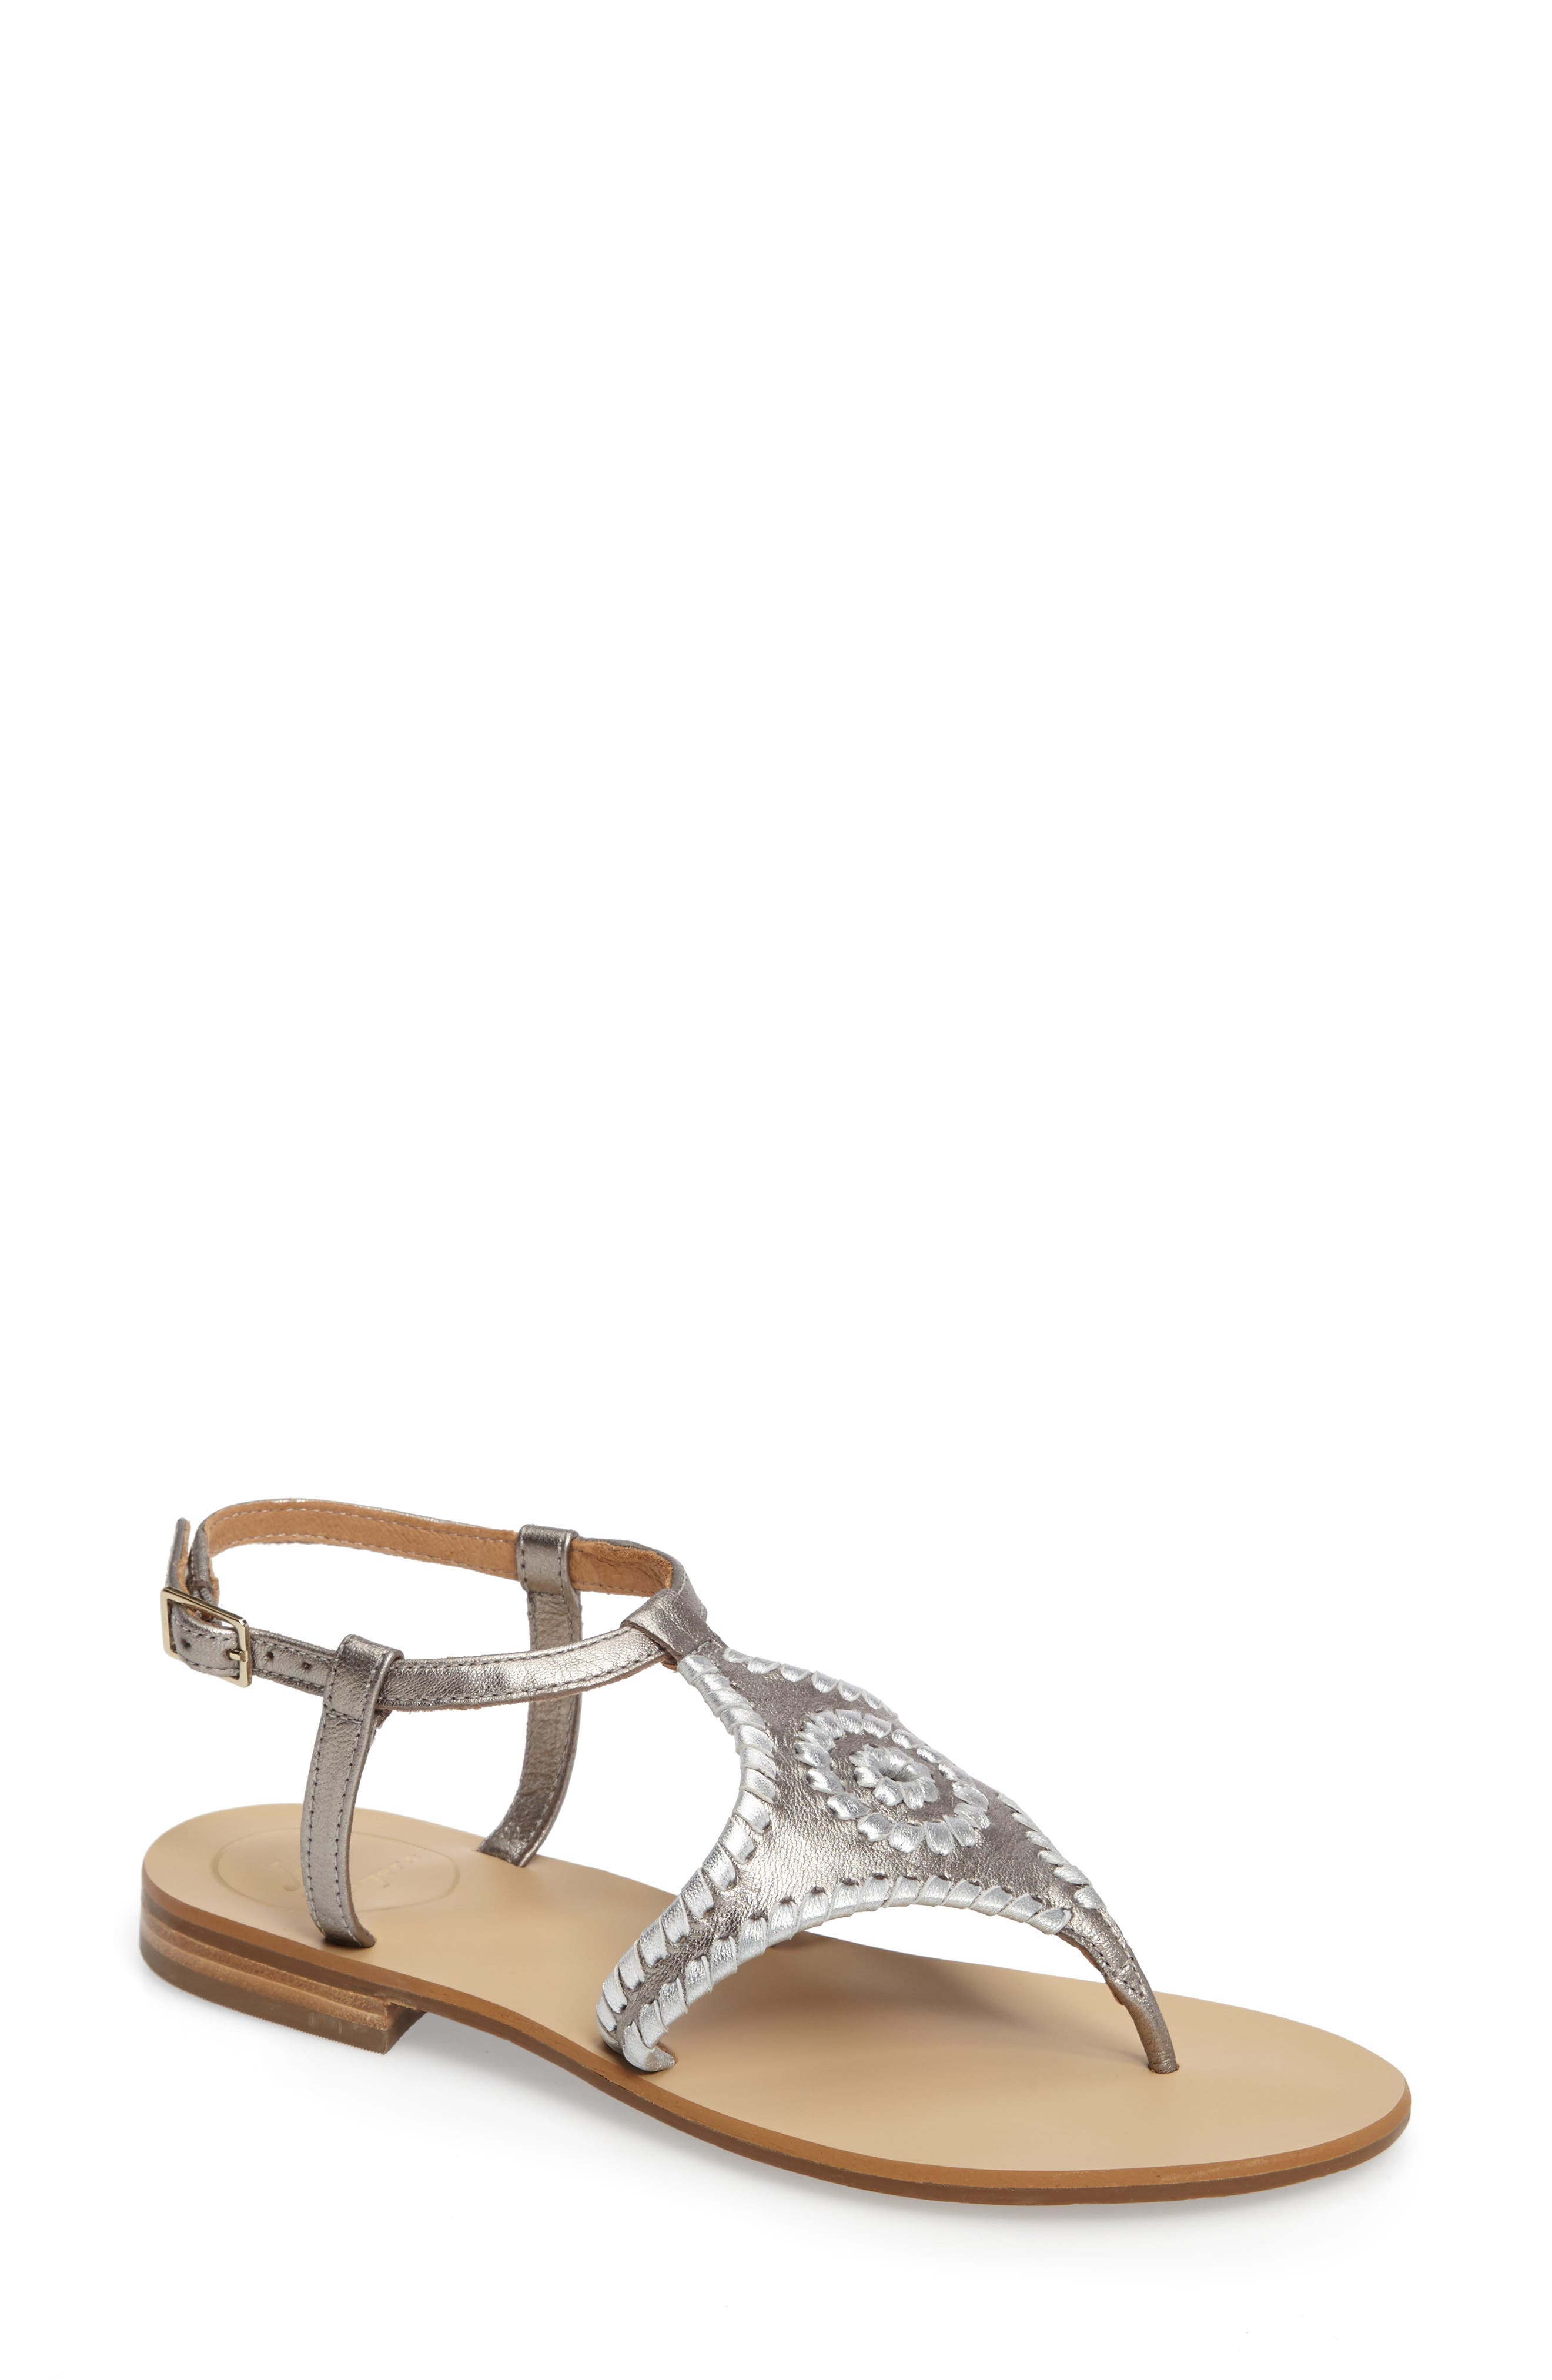 Main Image - Jack Rogers 'Maci' Flat Sandal (Women)